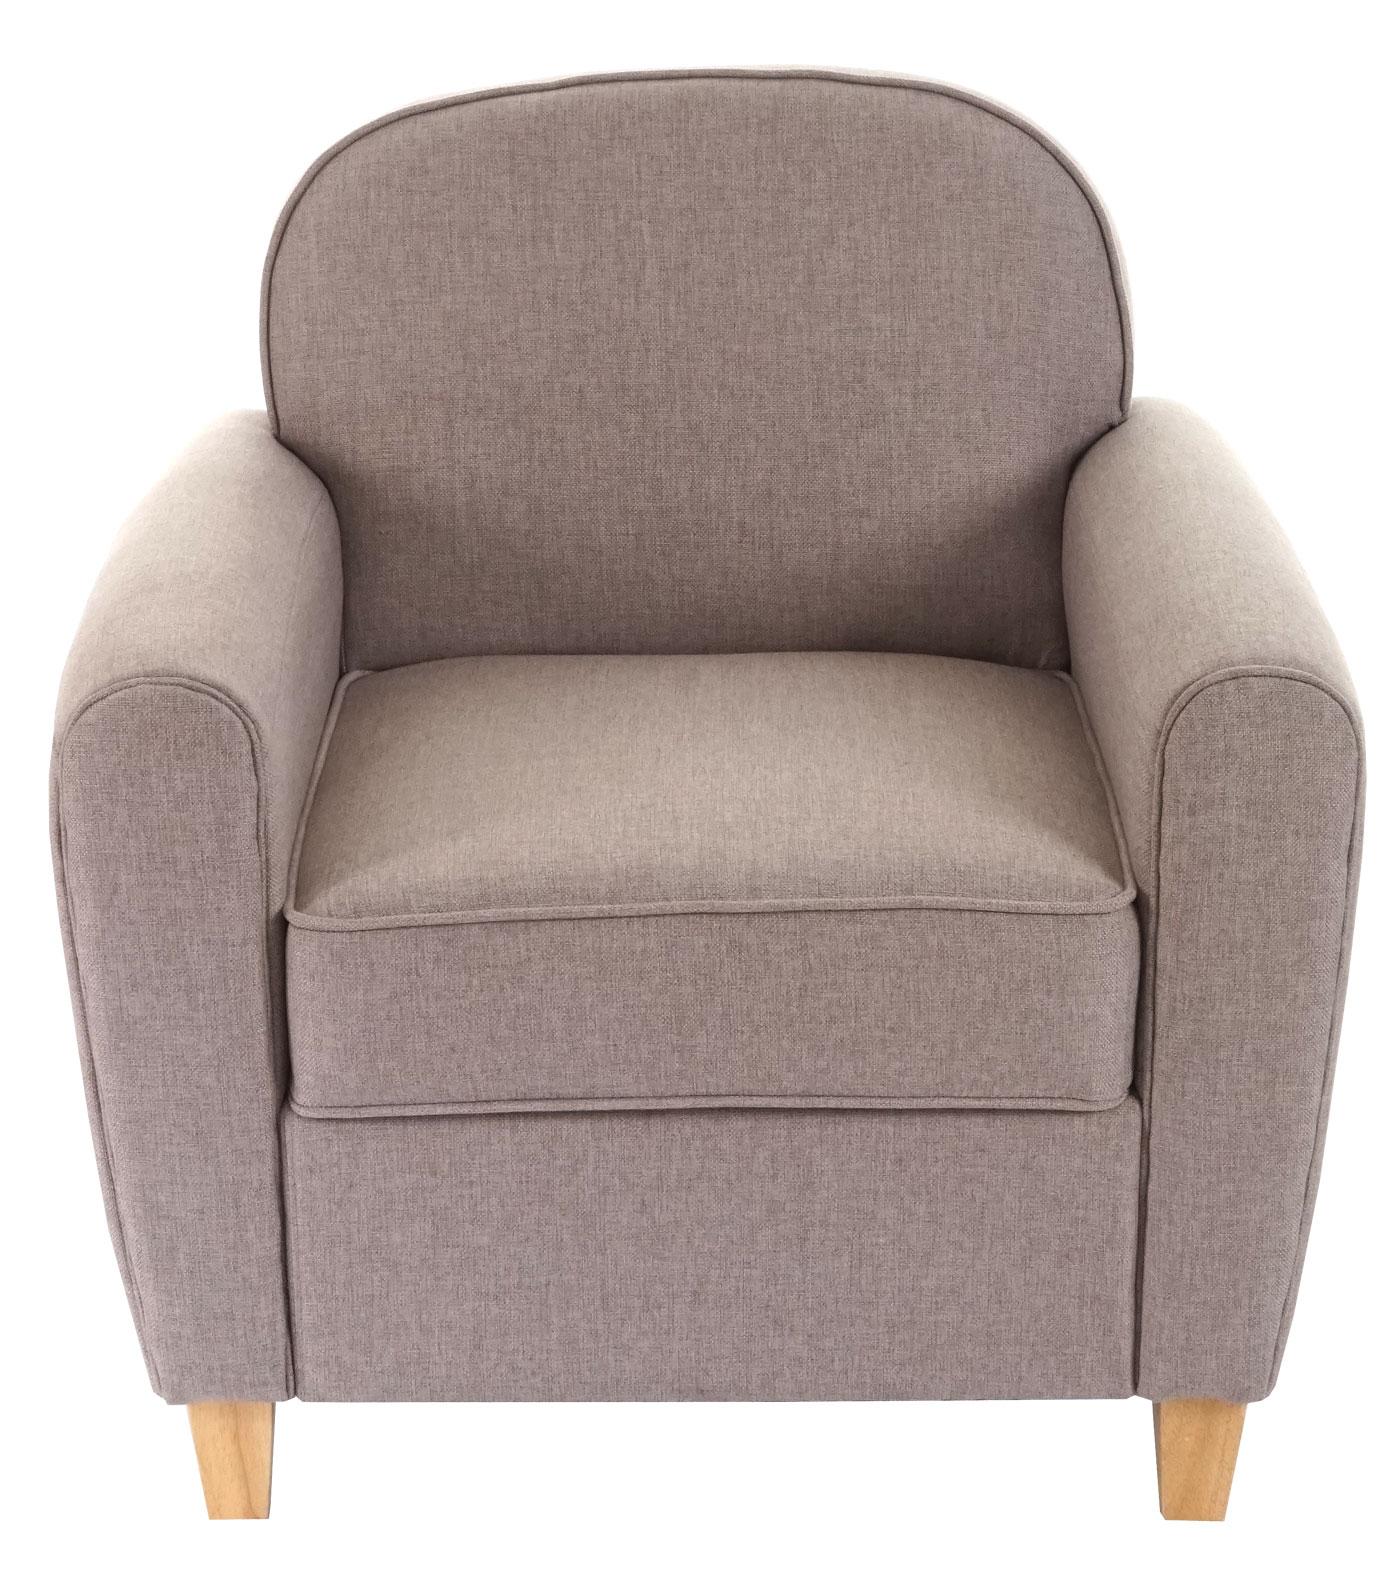 sessel malm t377 loungesessel polstersessel retro 50er. Black Bedroom Furniture Sets. Home Design Ideas